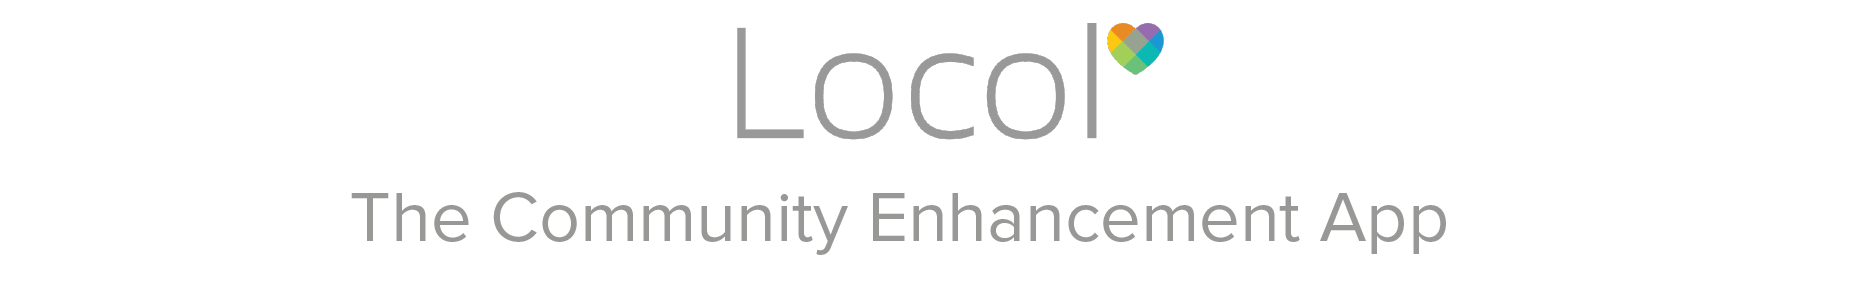 Locol Logo